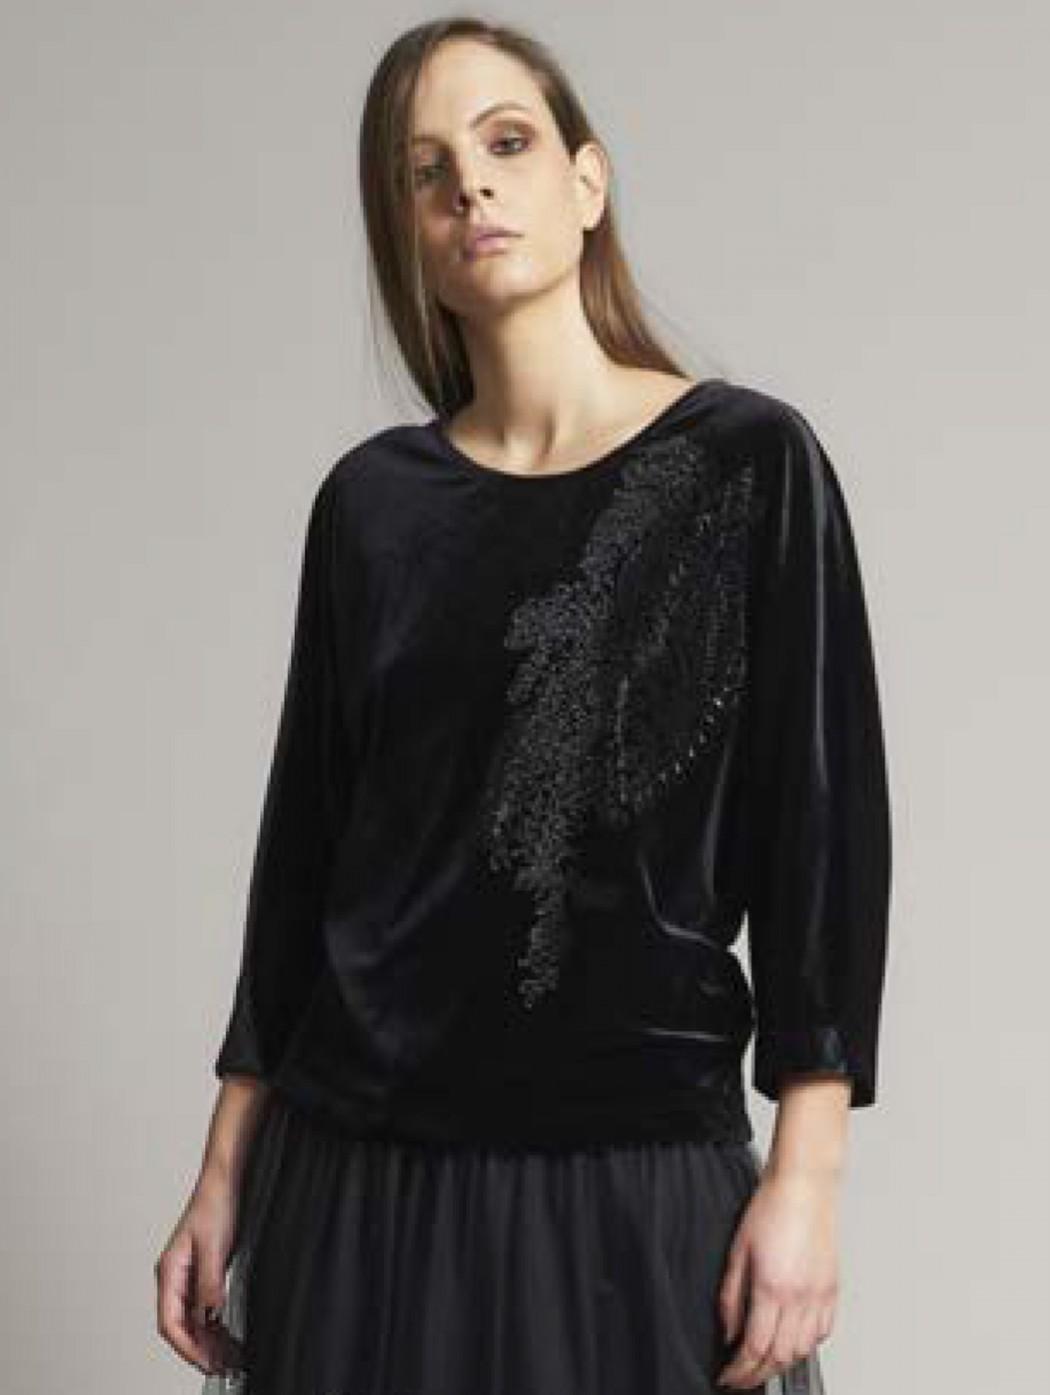 Piero Moretti Black Velvet Rhinestones Kimono Blouse Shirt